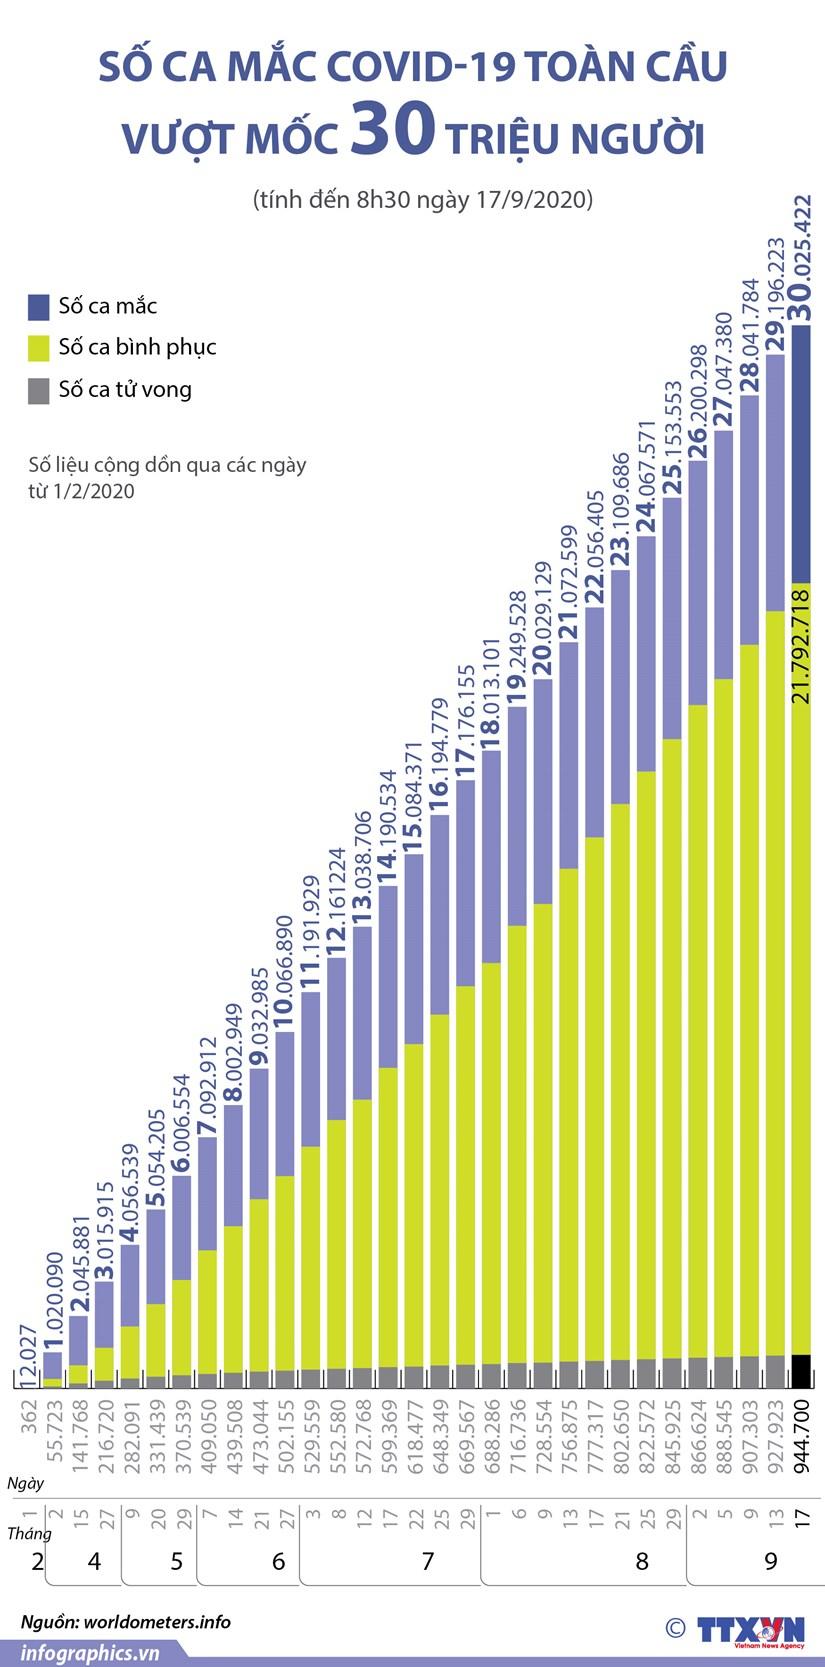 [Infographics] So ca mac COVID-19 toan cau vuot moc 30 trieu nguoi hinh anh 1